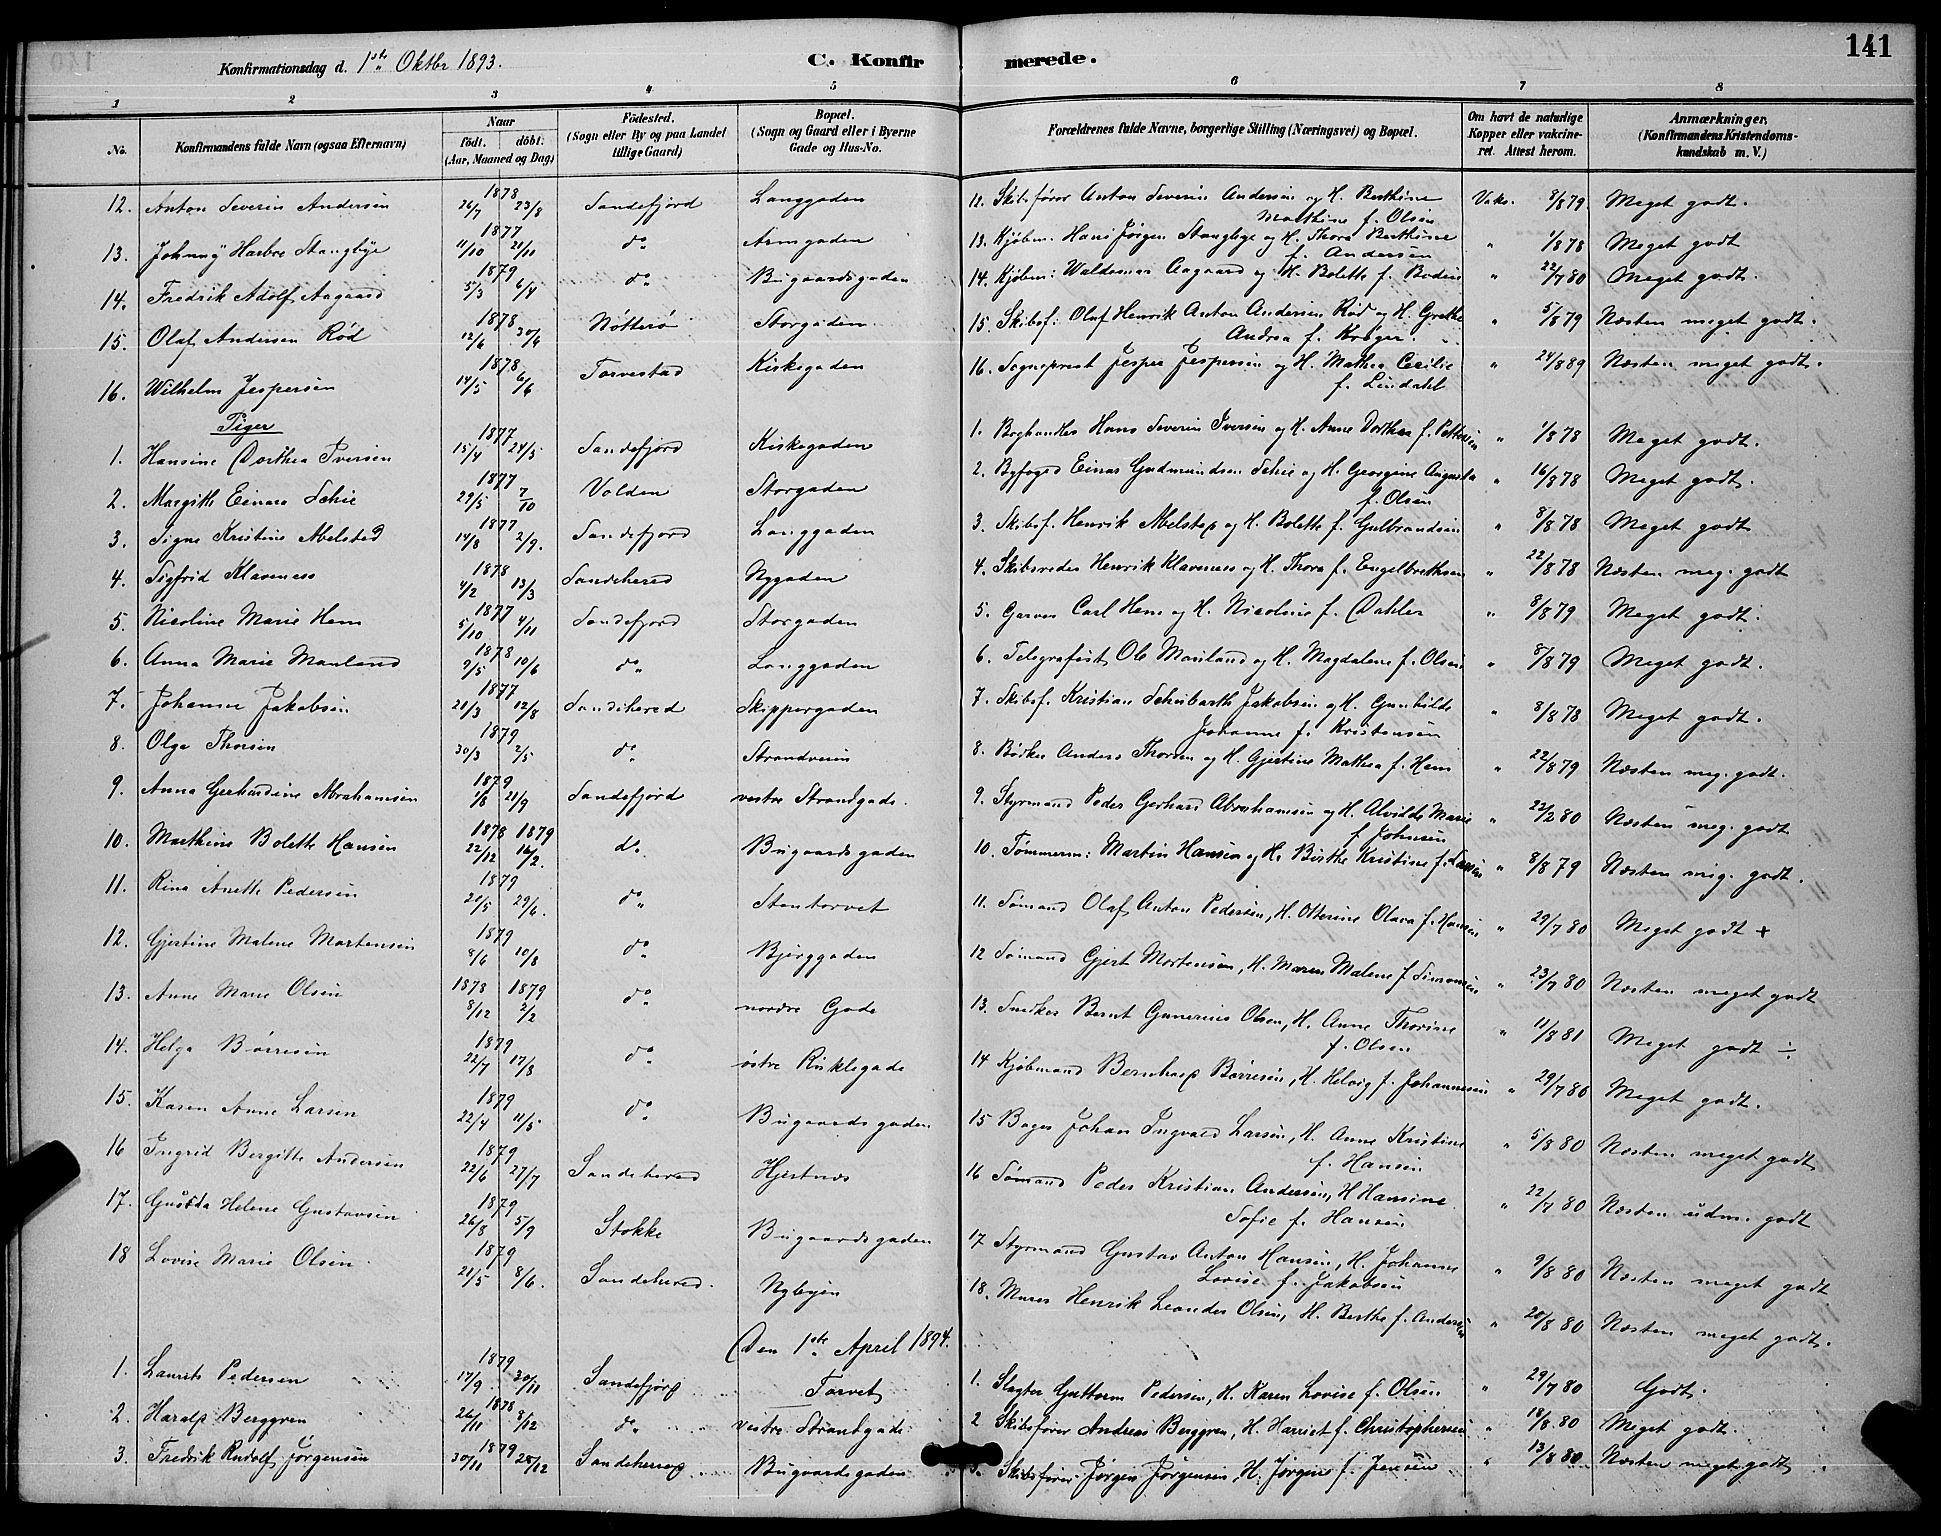 SAKO, Sandefjord kirkebøker, G/Ga/L0001: Klokkerbok nr. 1, 1885-1903, s. 141